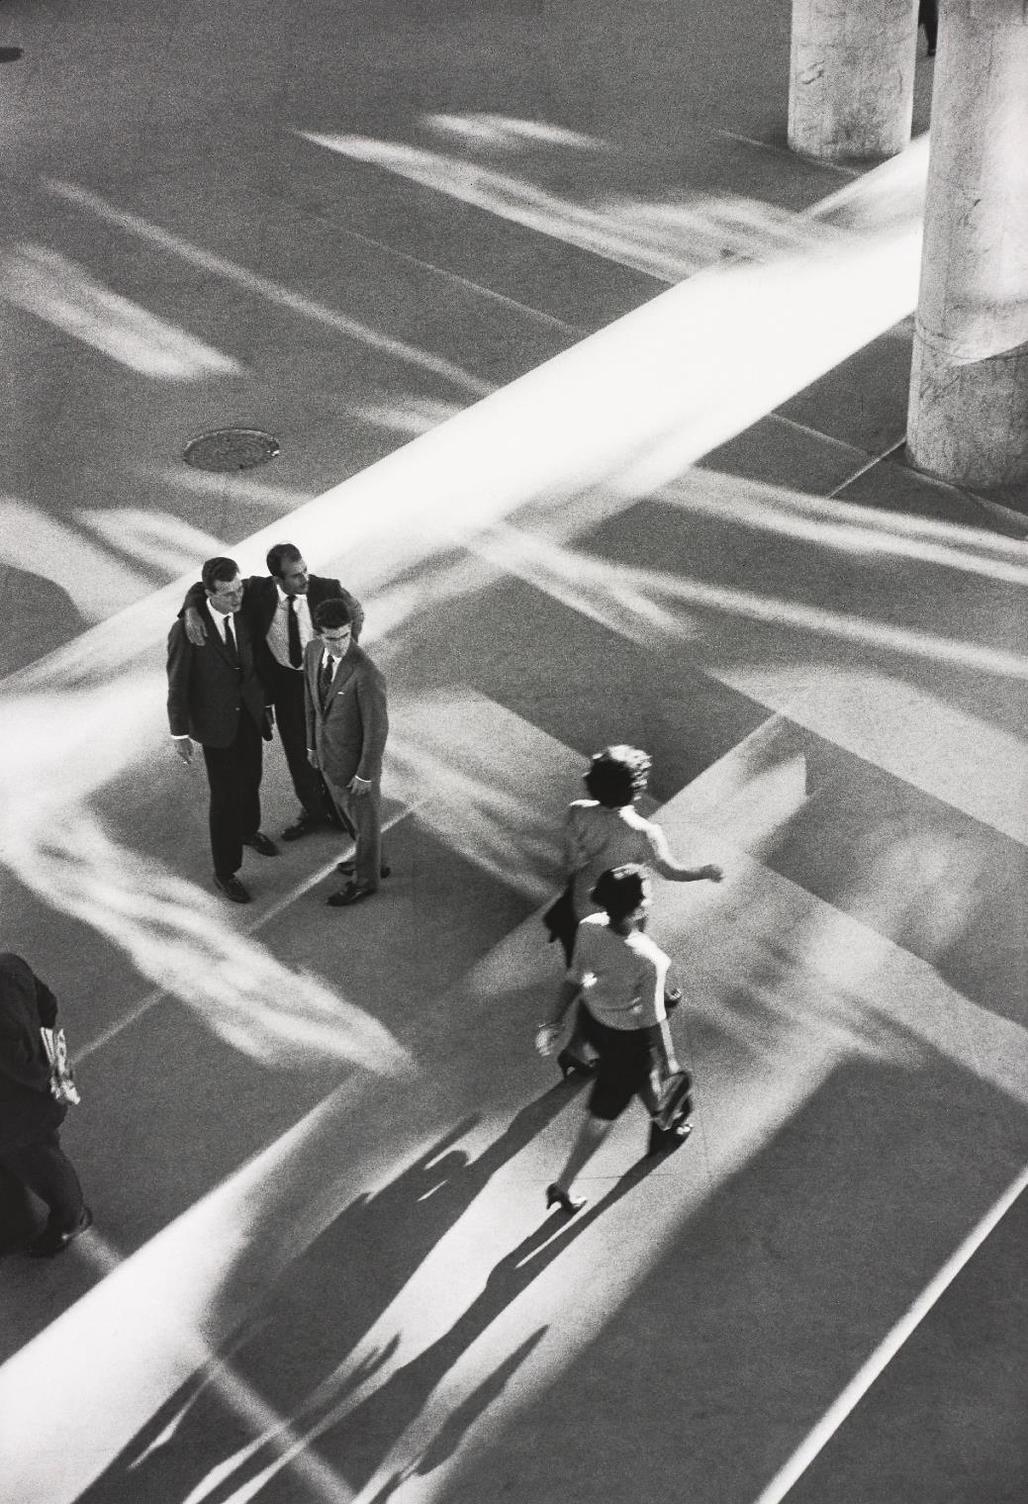 Rene Burri-In The Ministry Of Health, Rio De Janeiro, Brazil-1960